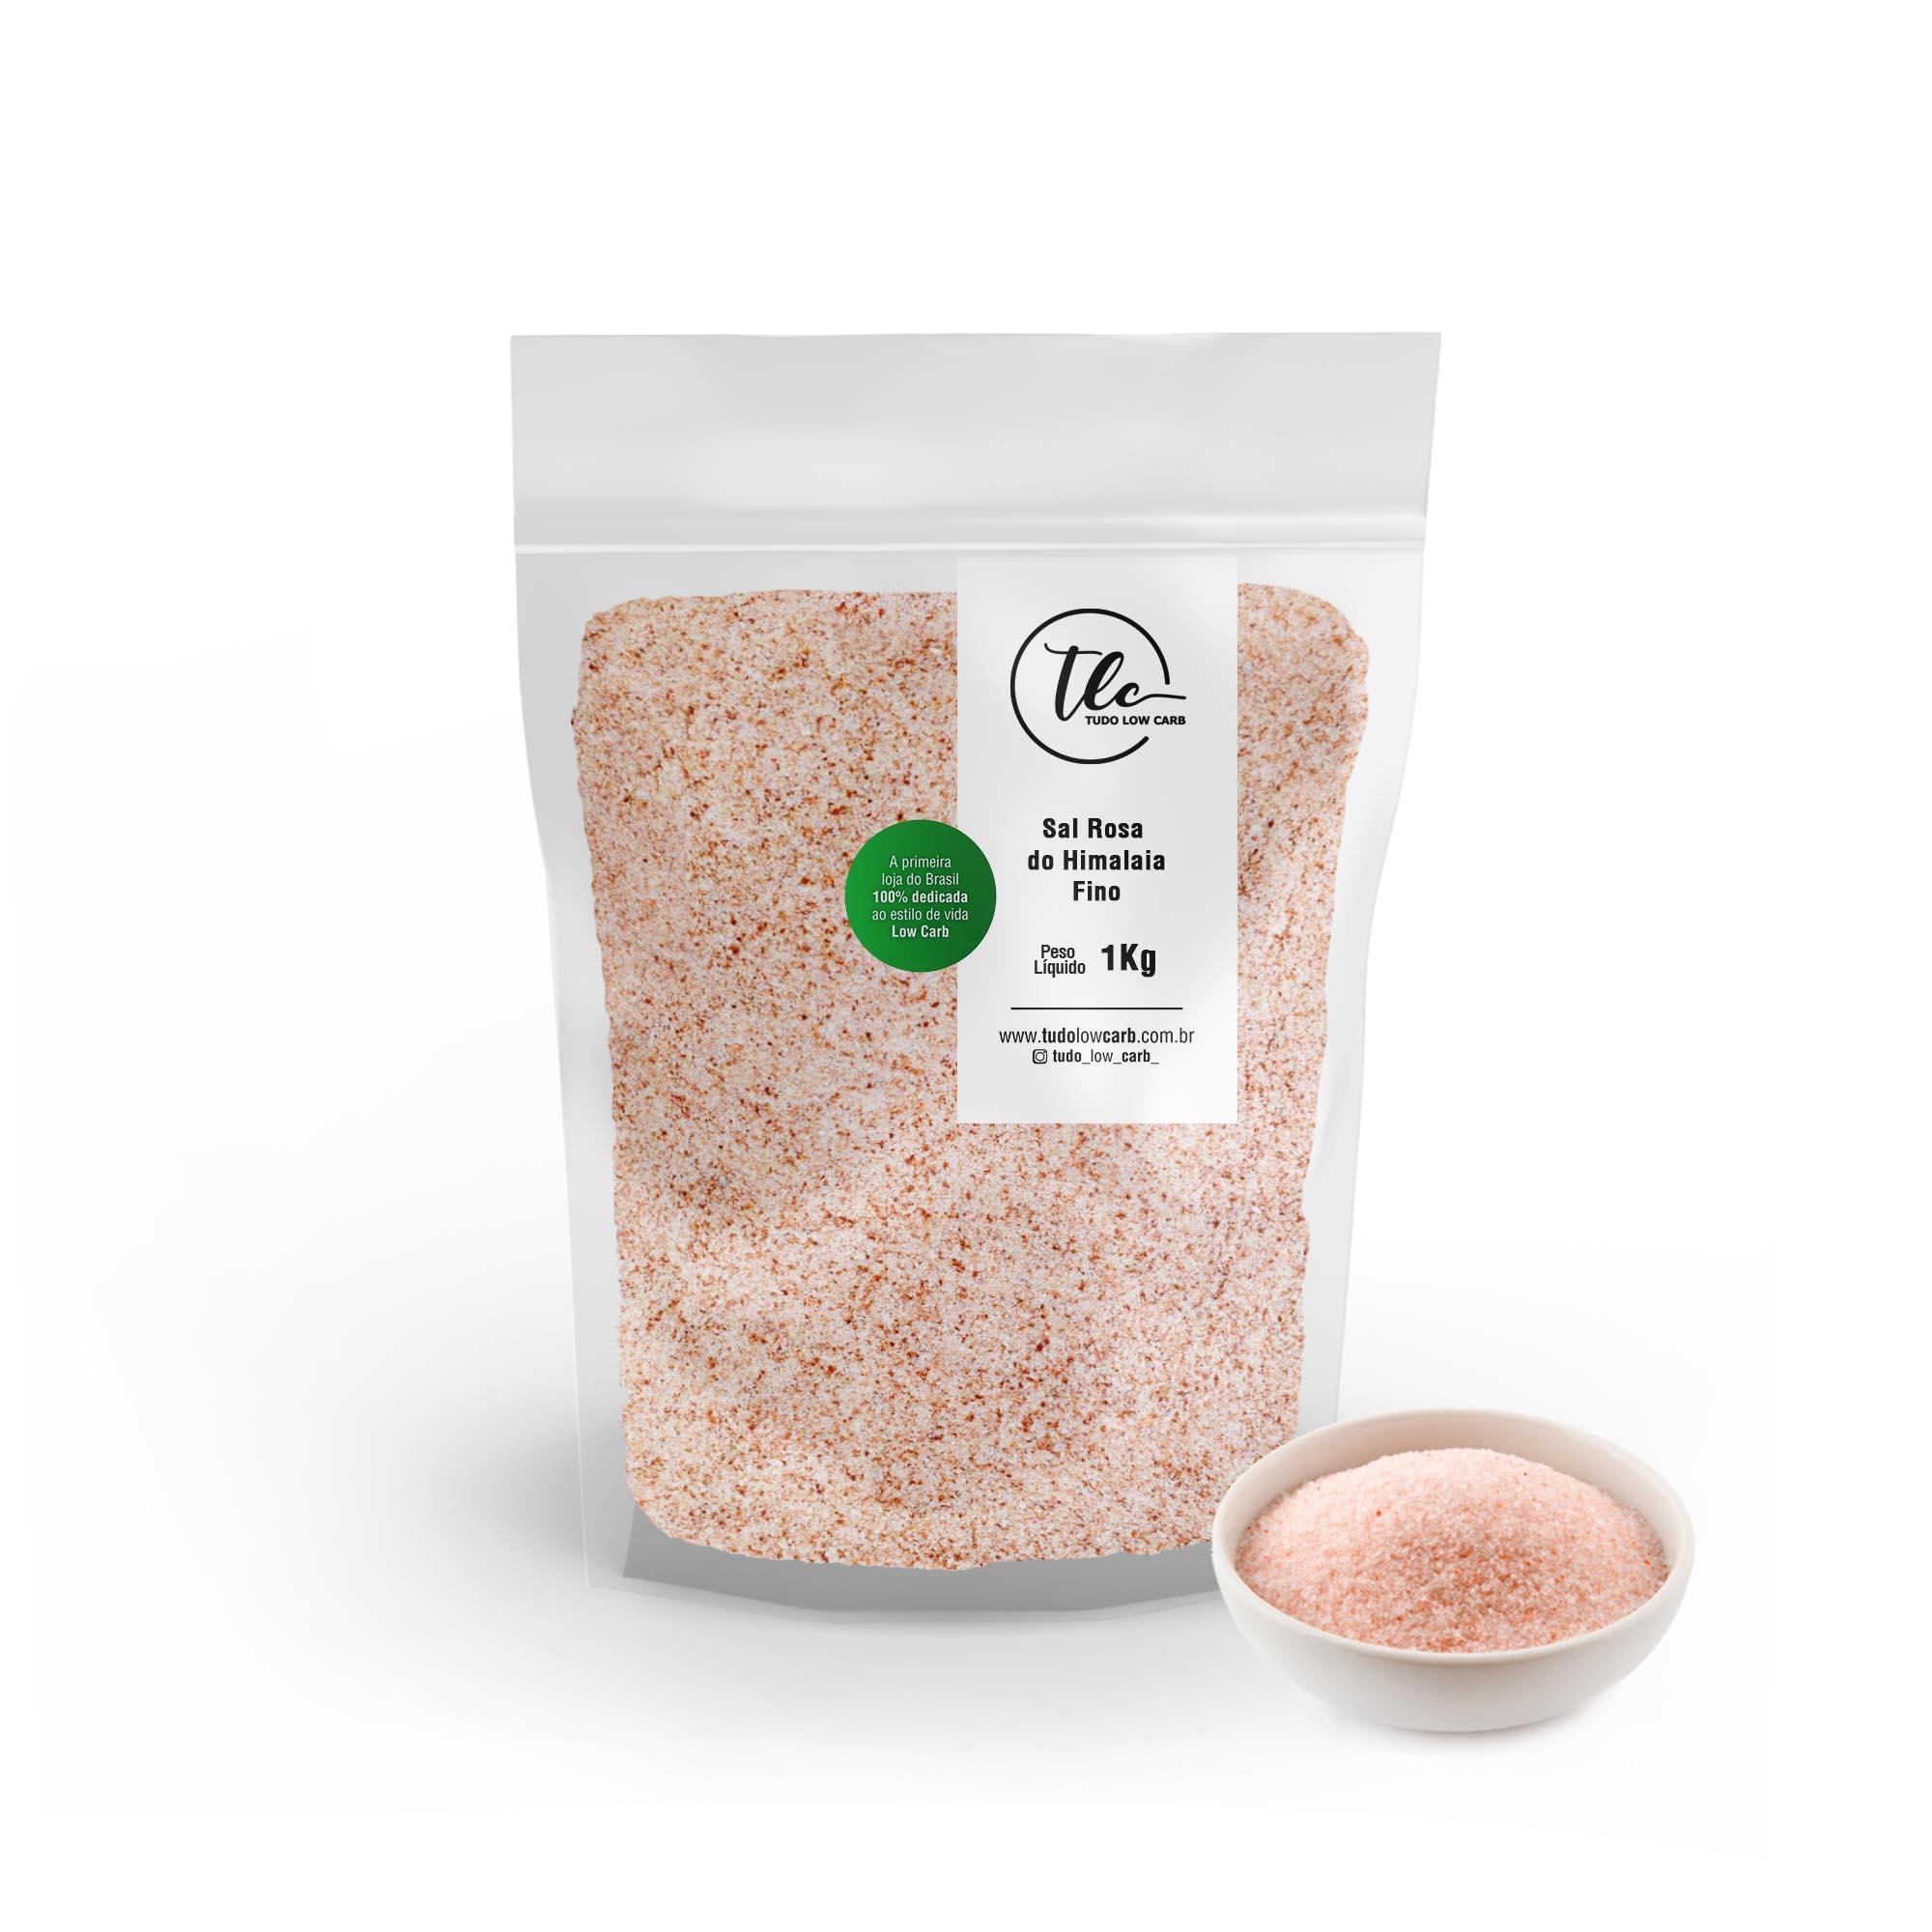 Sal Rosa do Himalaia Fino 1 kg  - TLC Tudo Low Carb